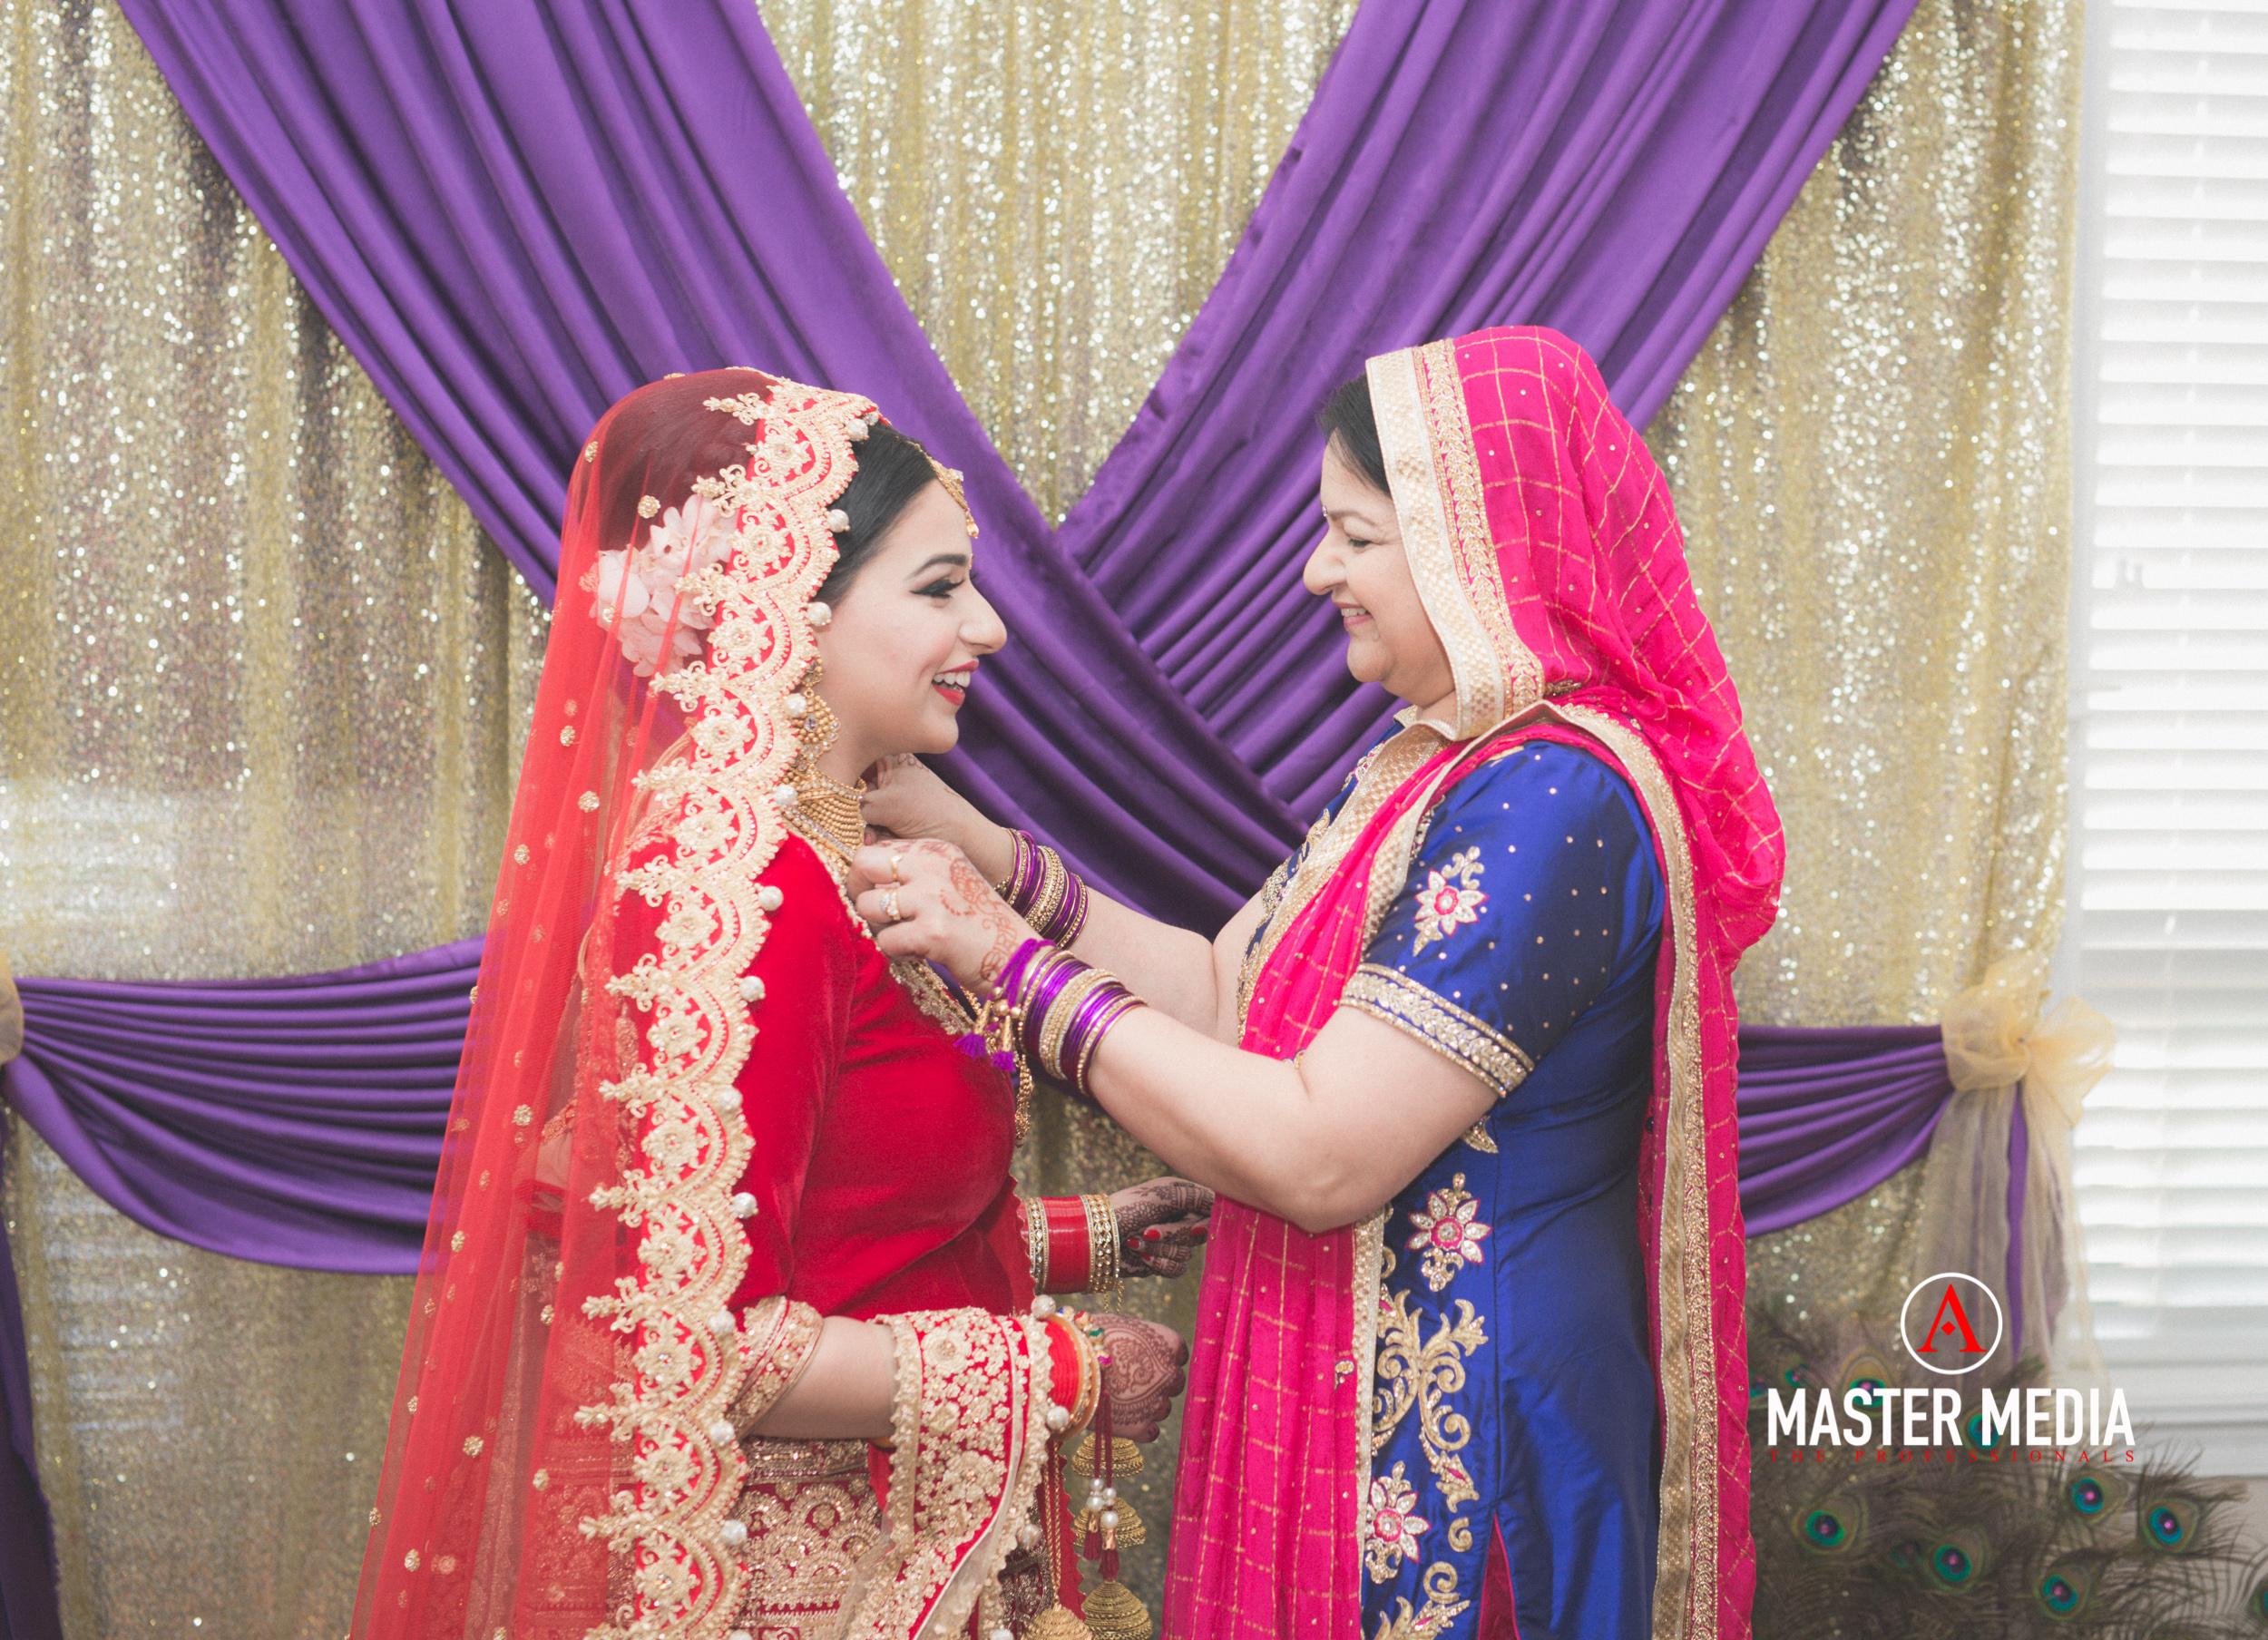 Jaskiran & Sandeep Wedding Day -7758.jpg